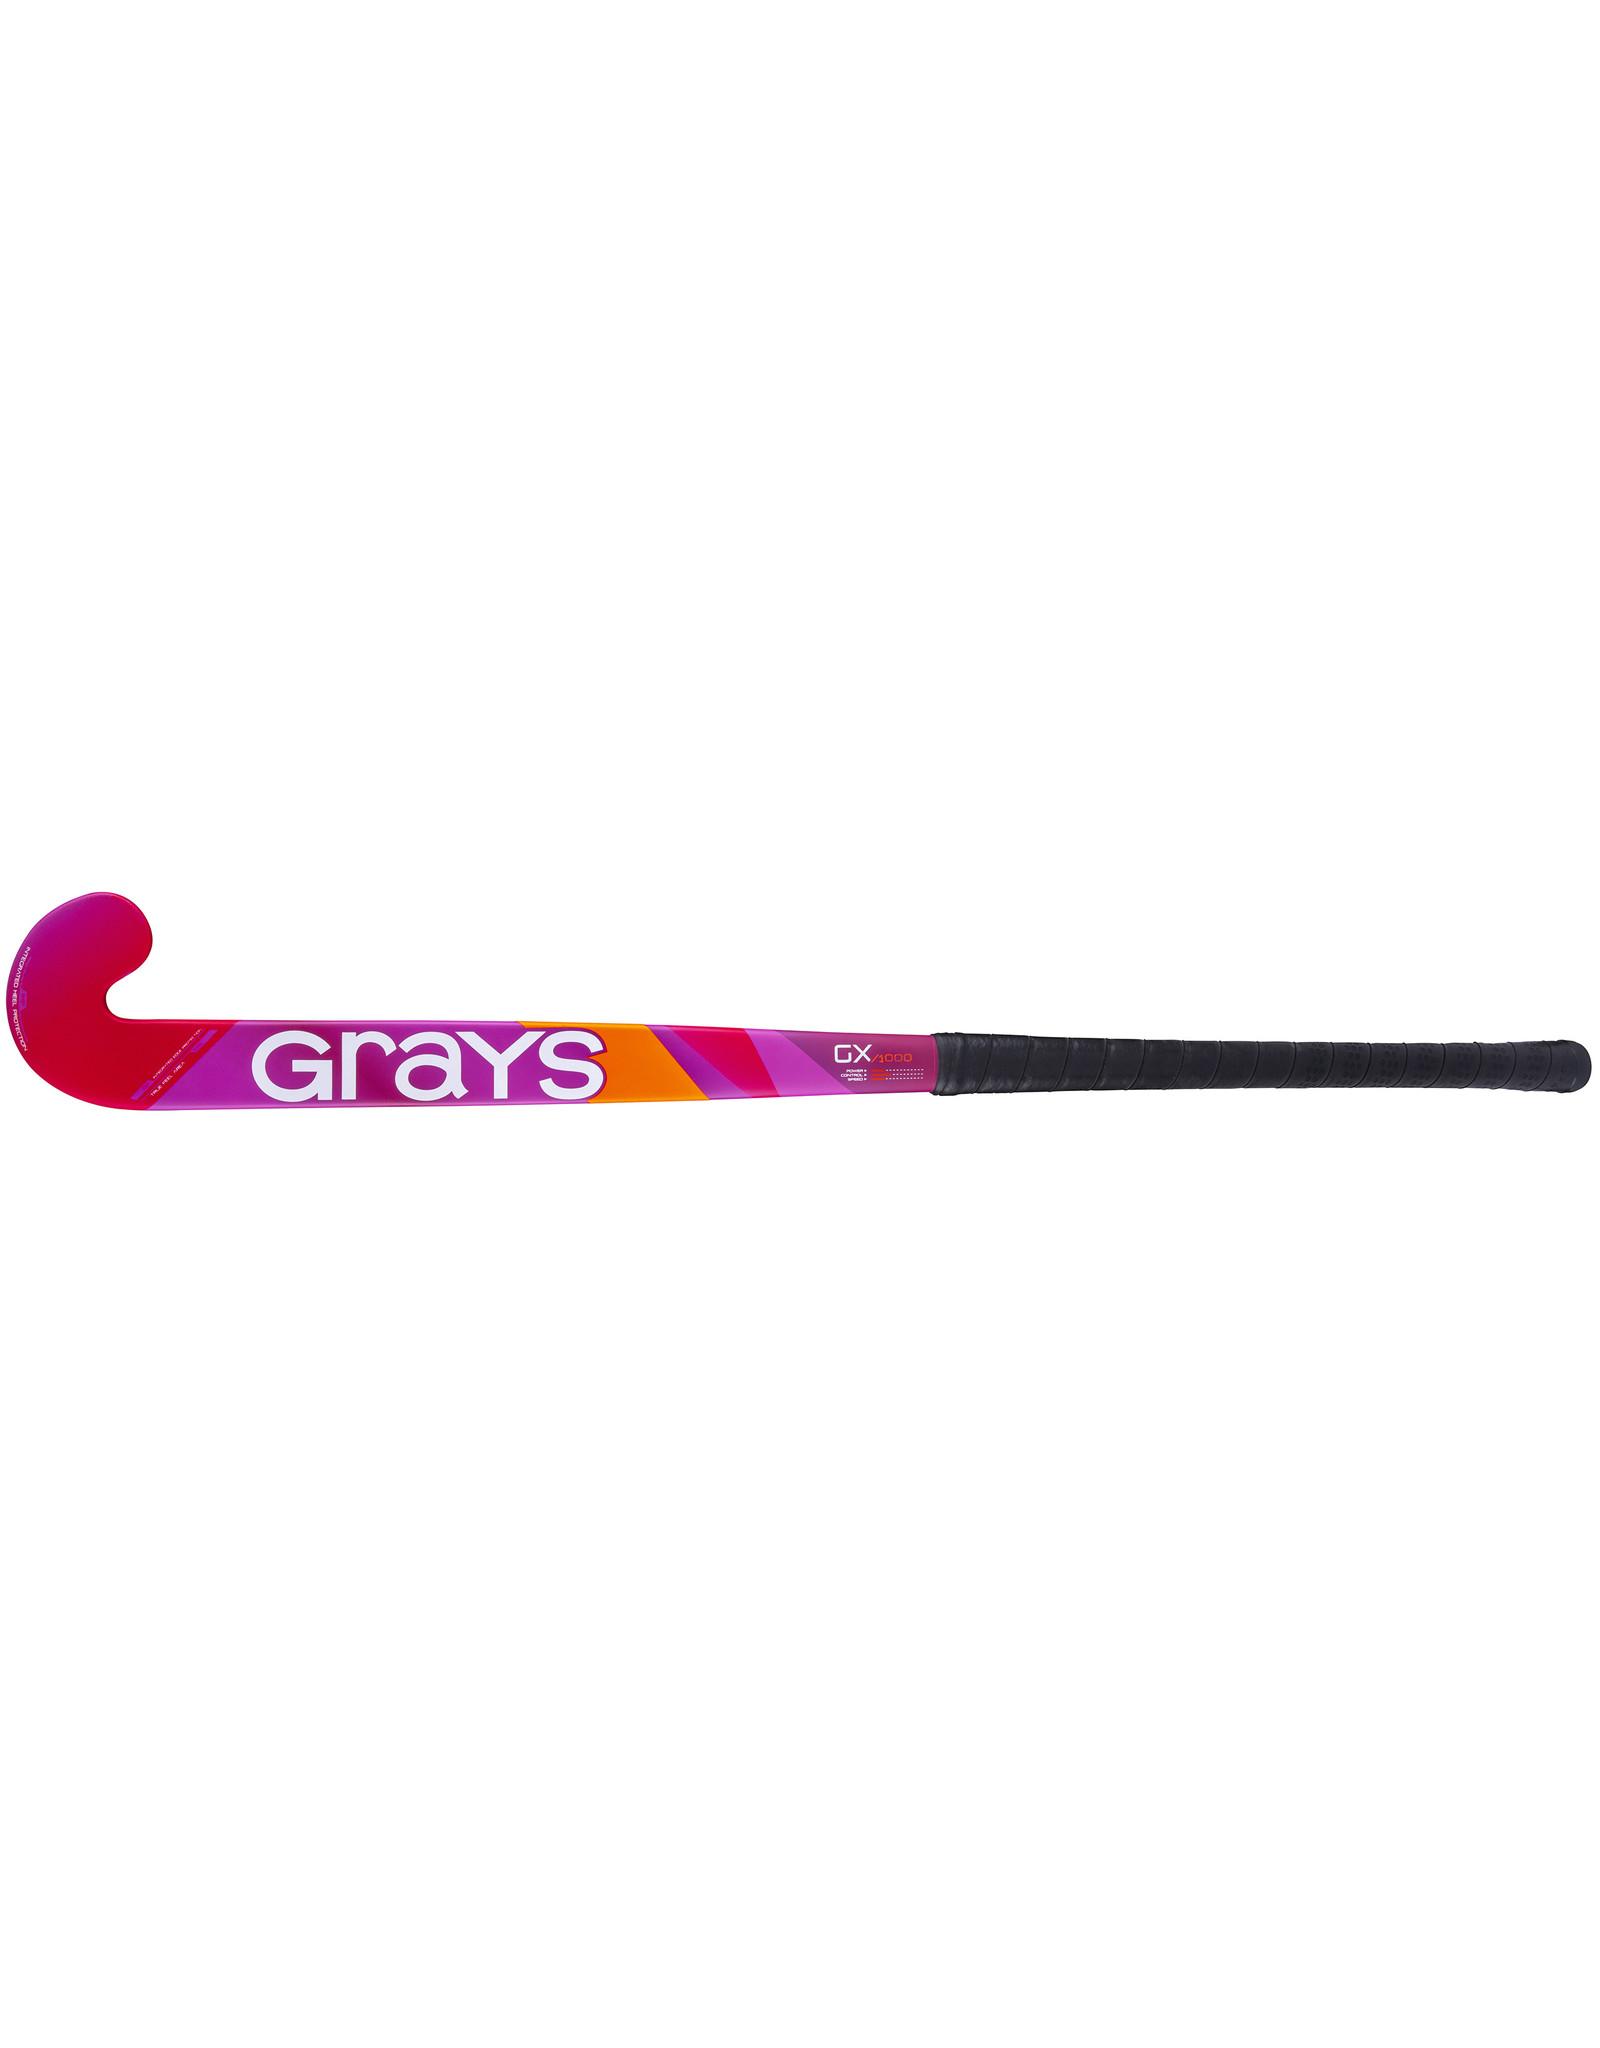 Grays STK GX1000 UB MC NEONROZE